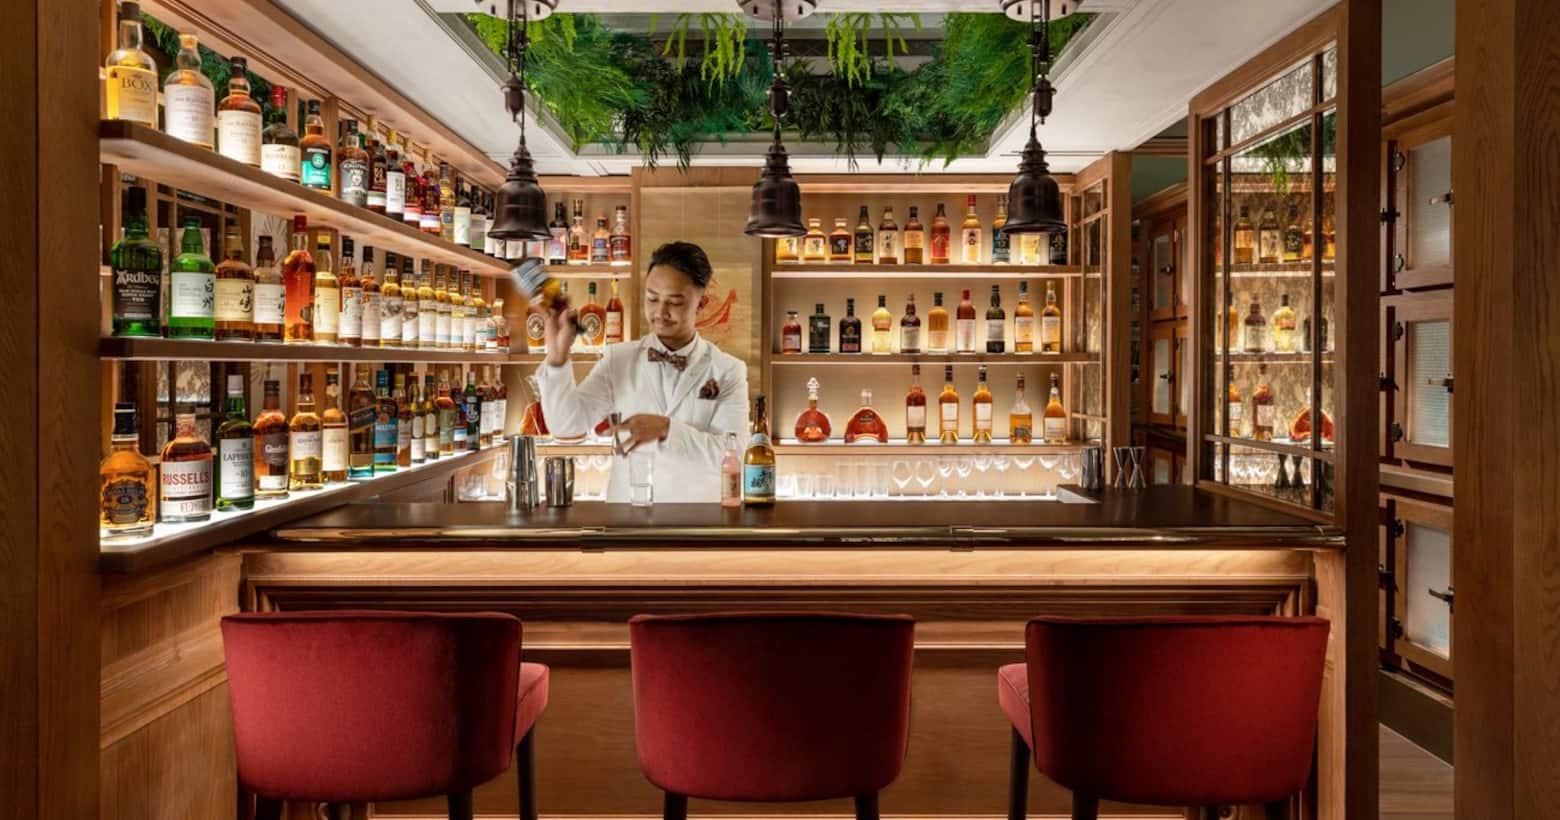 The Aubrey omakase bar